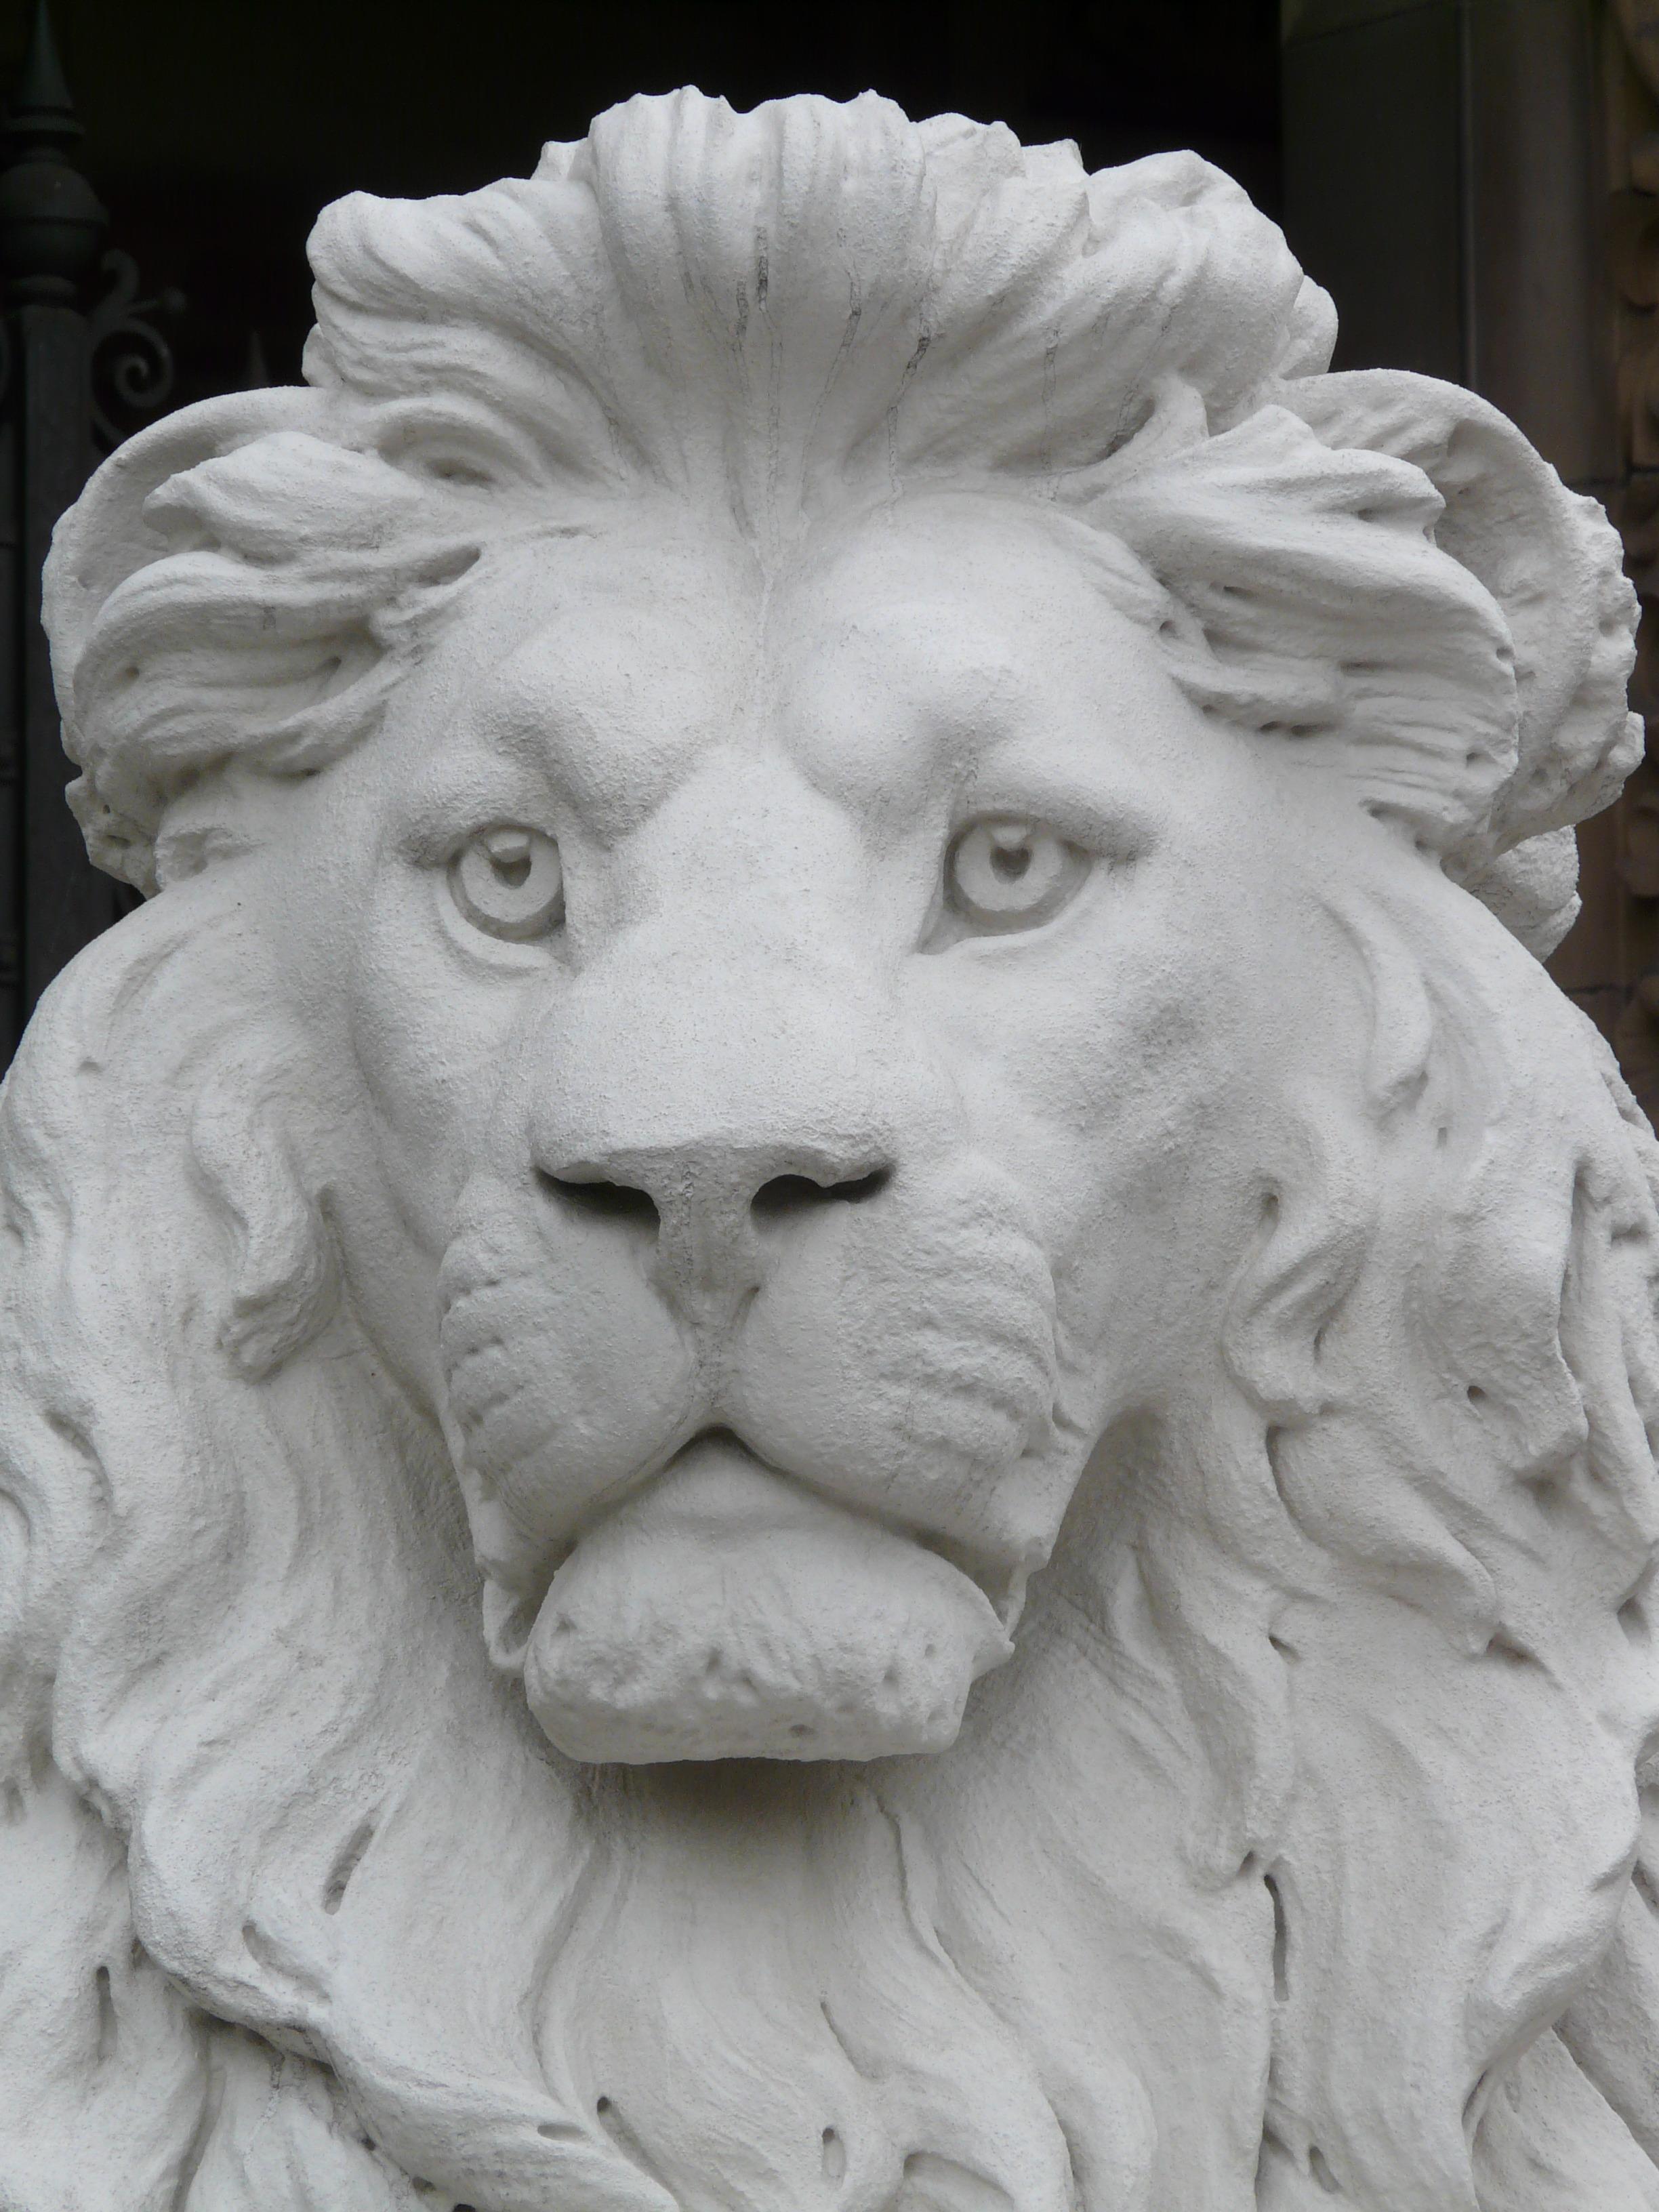 free images   white  animal  monument  statue  monochrome  lion  art  head  relief  gypsum